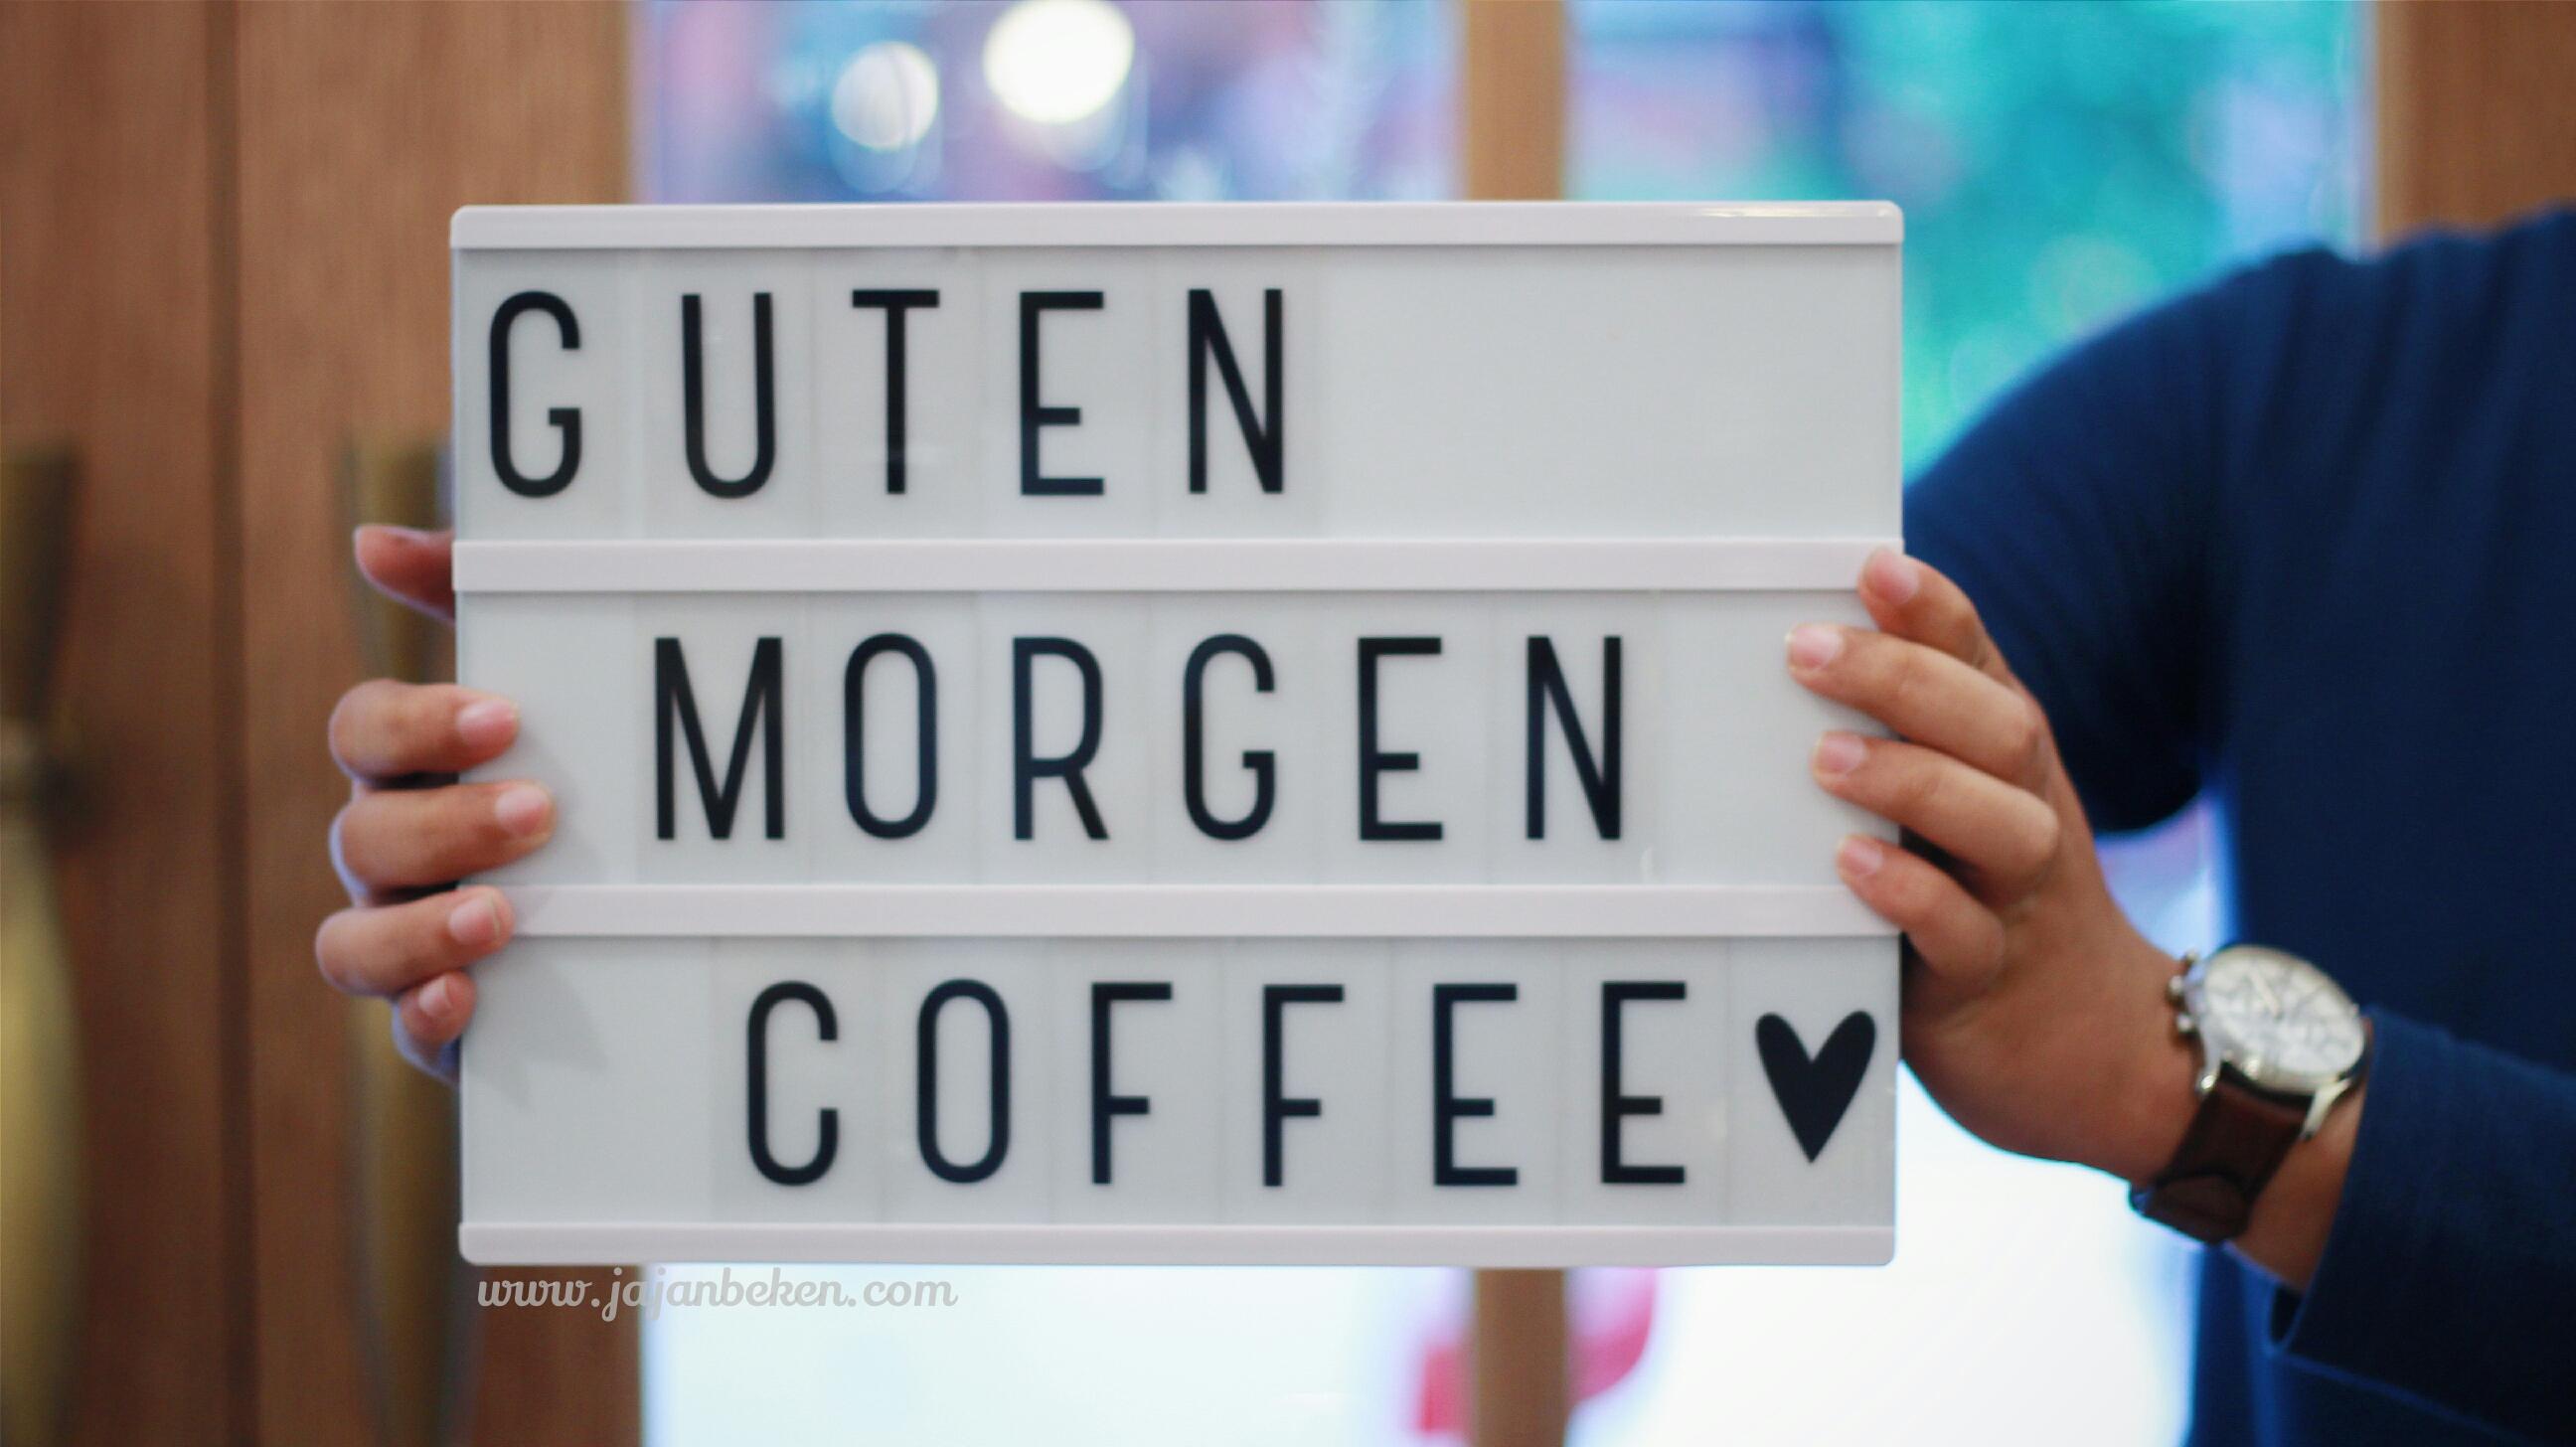 jajanbeken guten morgen cafe